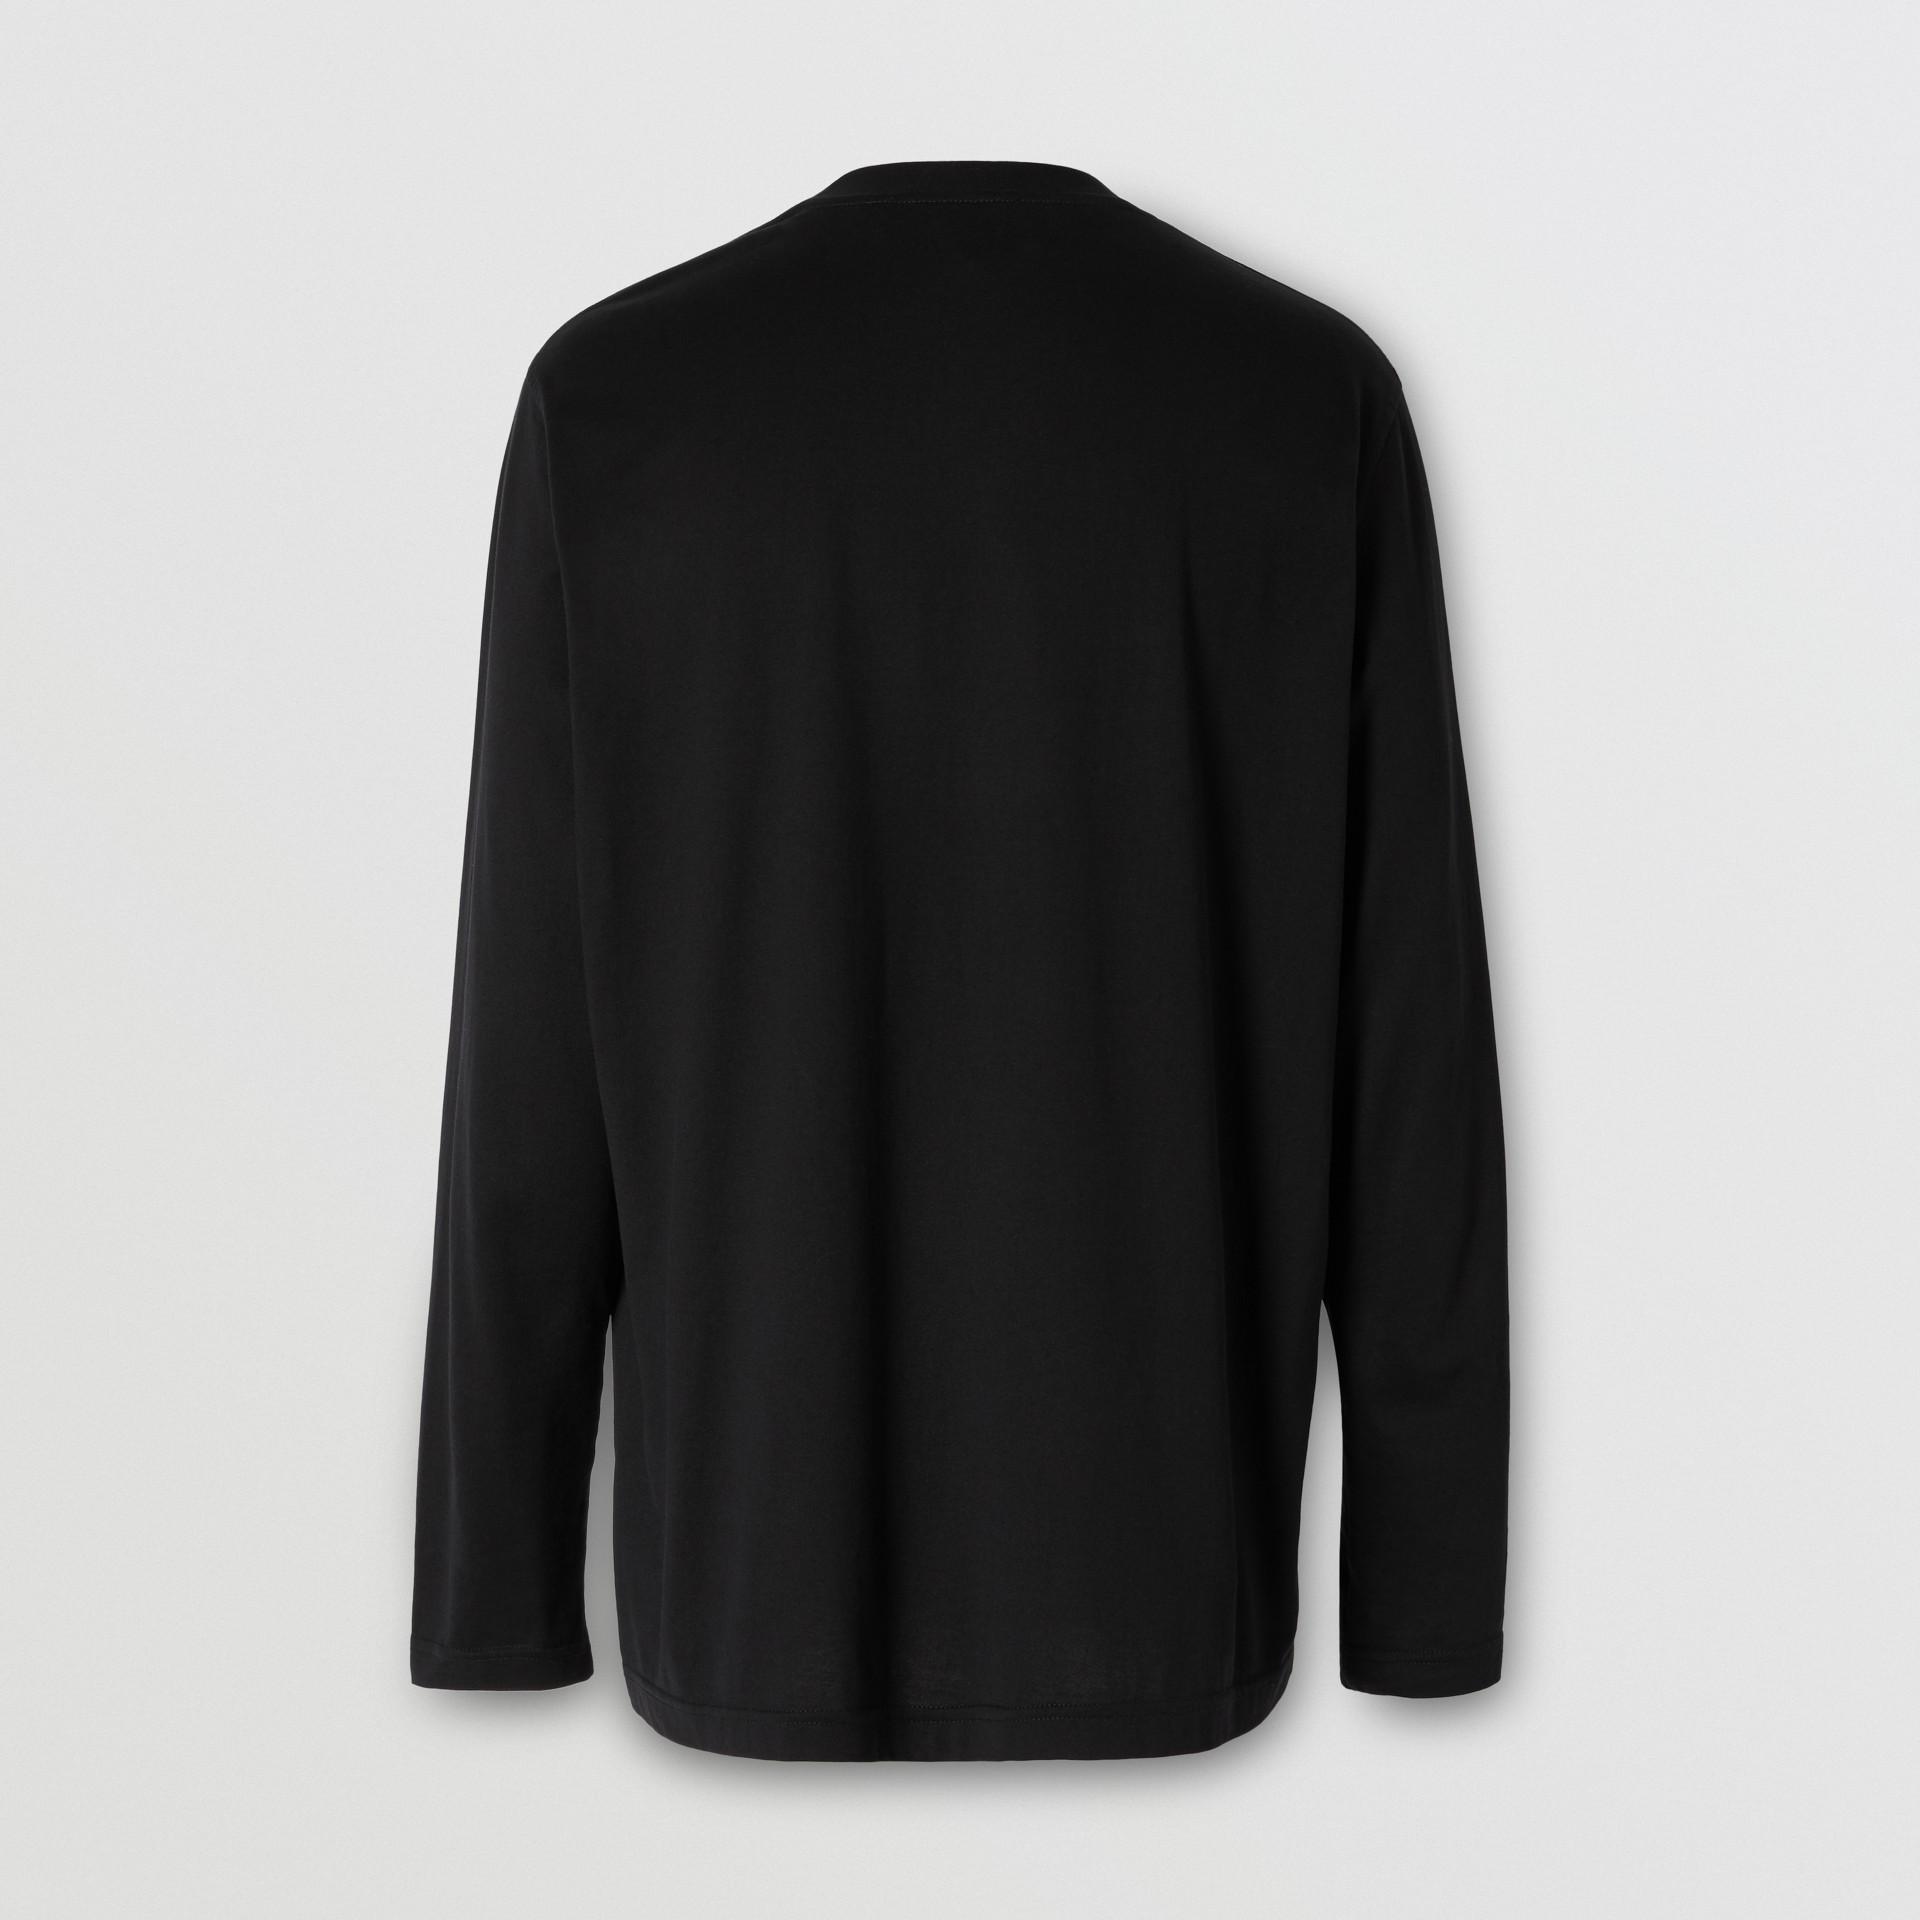 Long-sleeve Monogram Motif Cotton Top in Black - Men | Burberry - gallery image 5